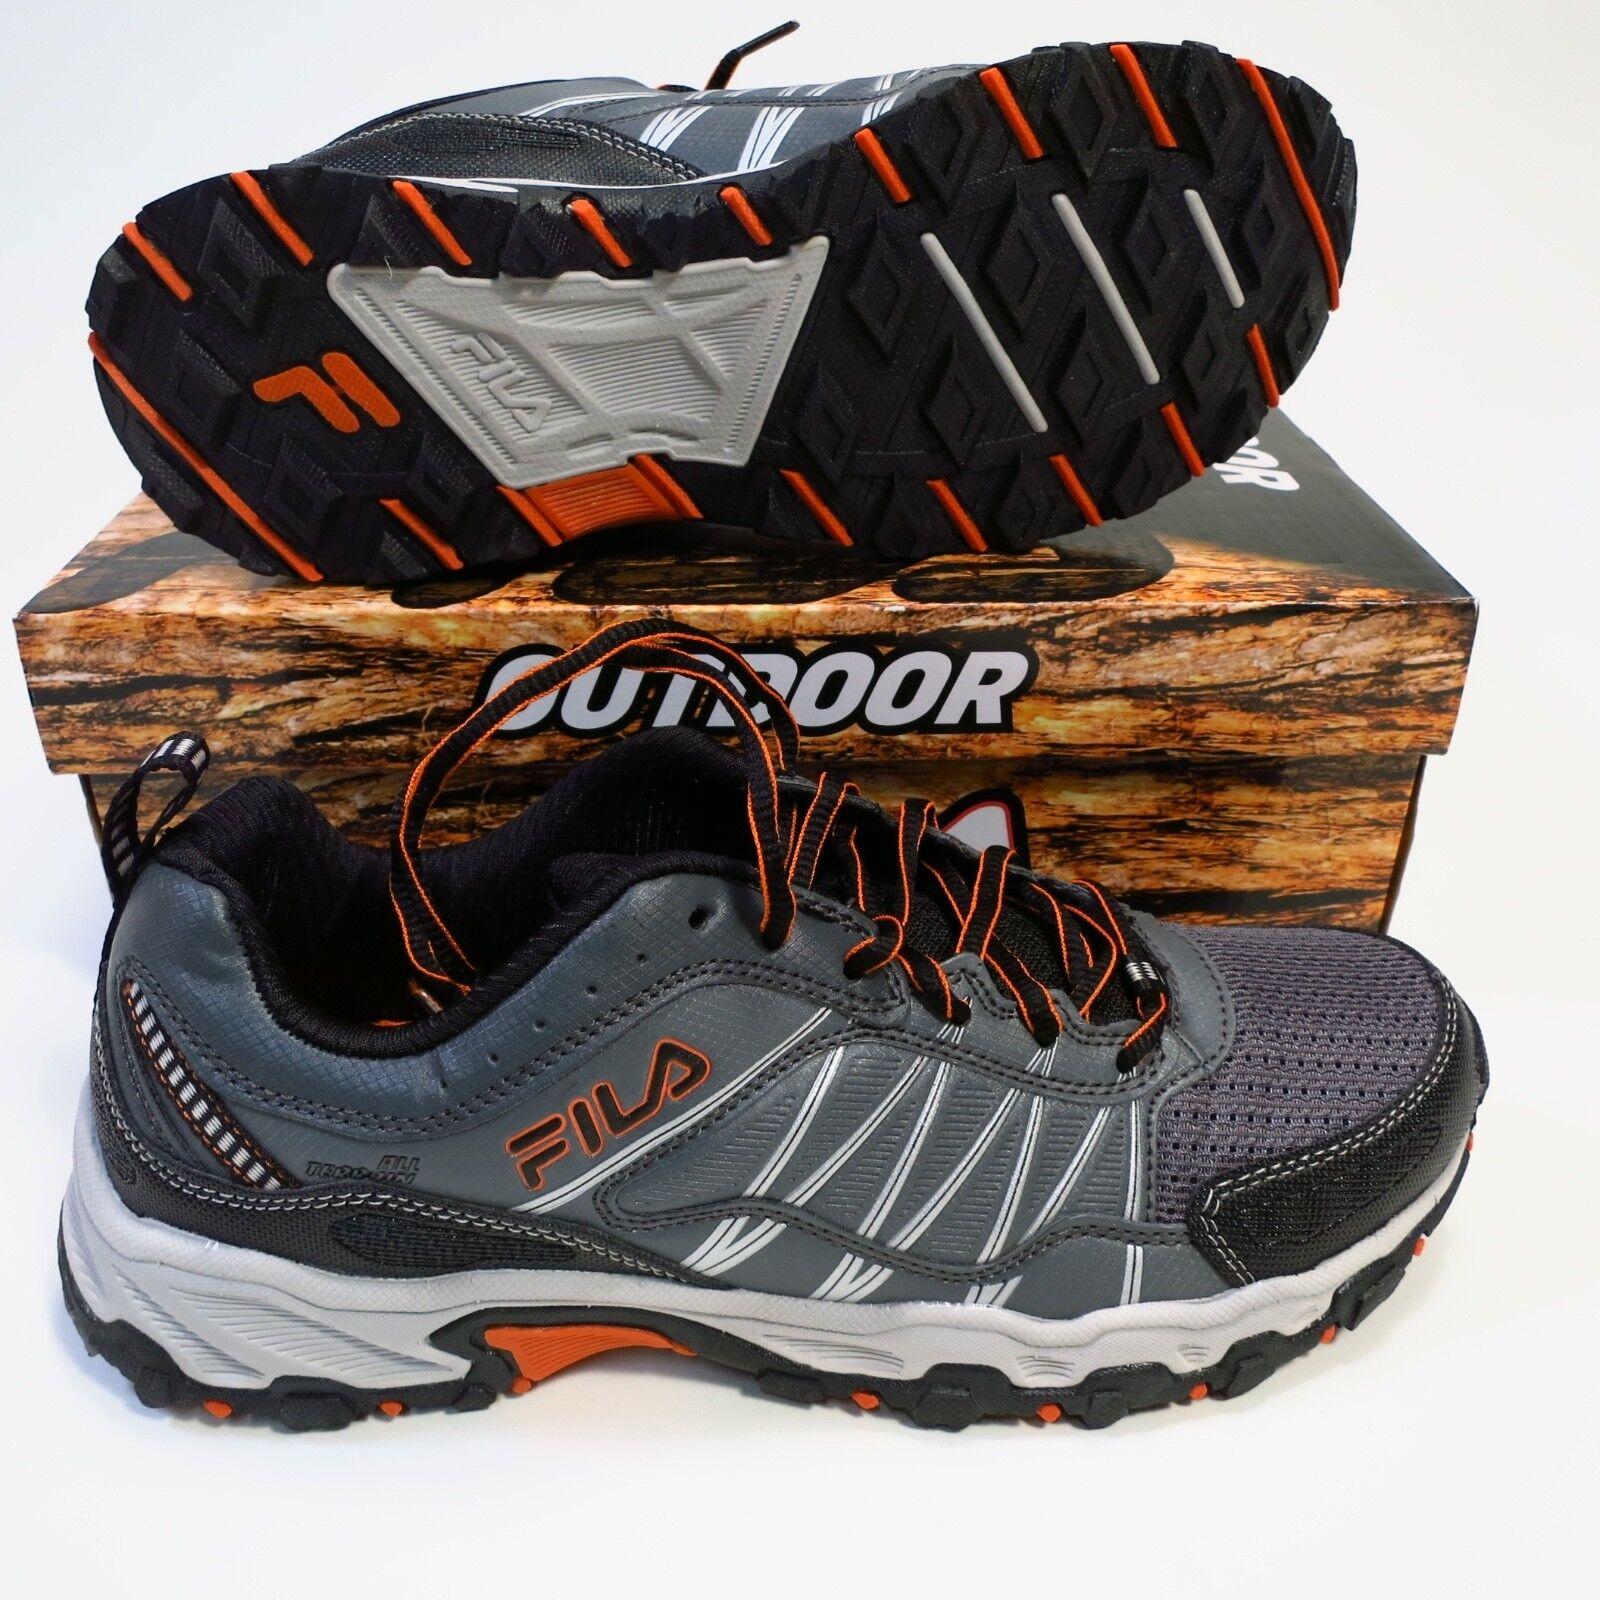 70 Men's FILA AT Peake 18 Tral shoes Grey orange Size 9.5 NEW